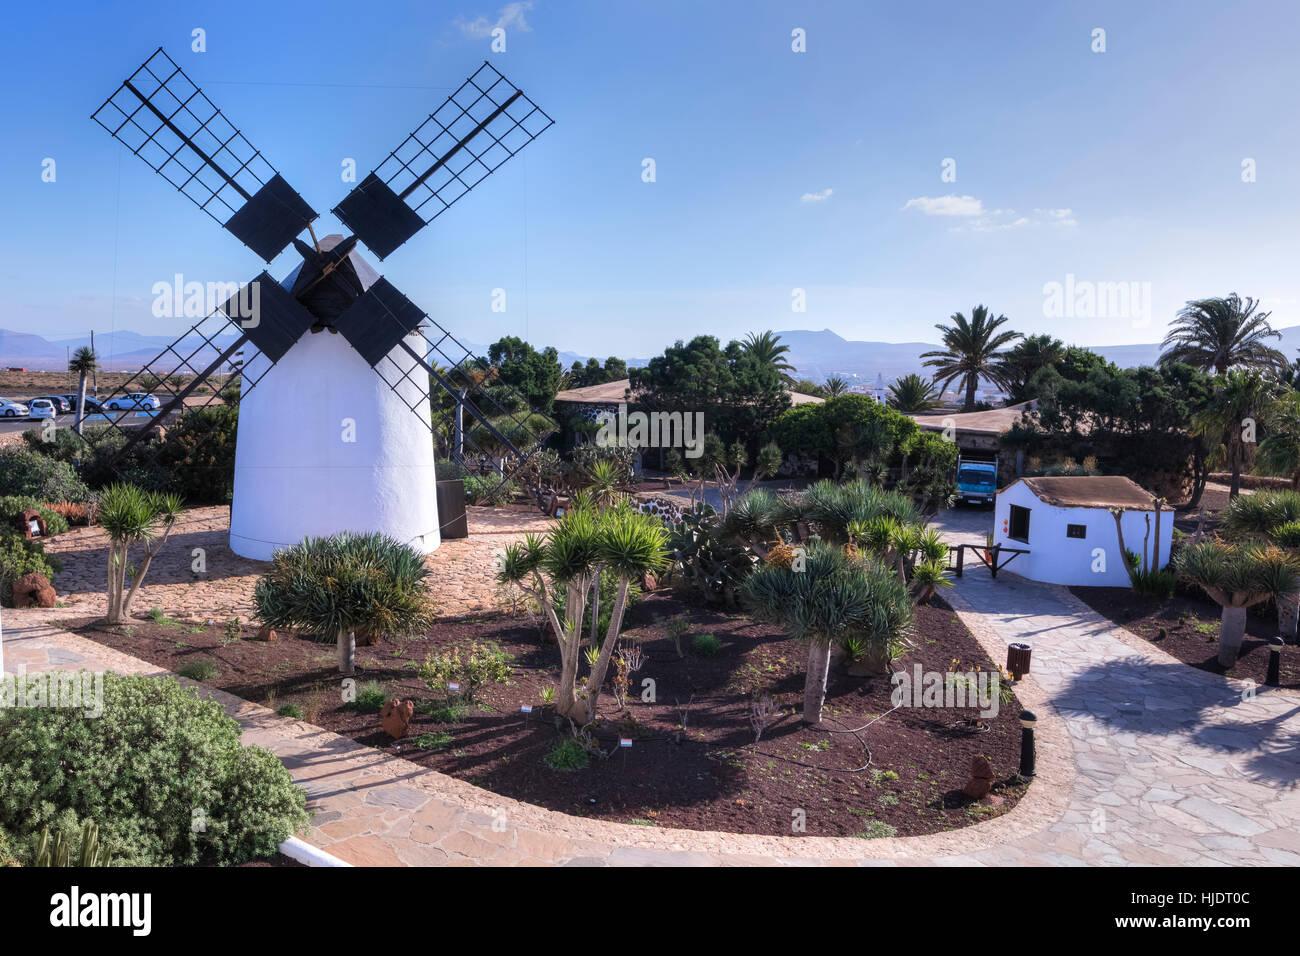 Molino de Antigua, Antigua, Fuerteventura, Canary Islands, Spain - Stock Image